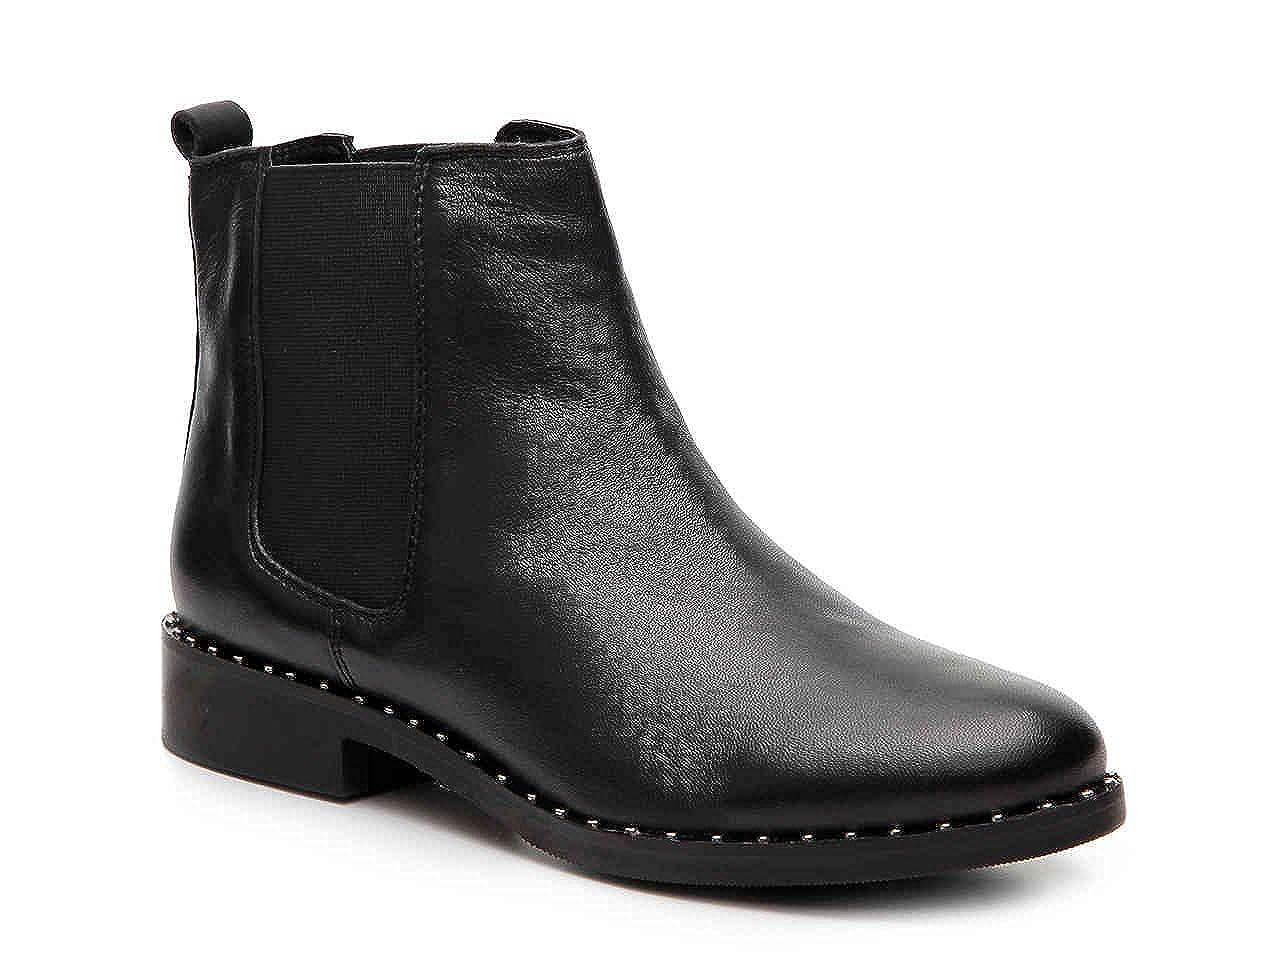 c6c6c98241b Amazon.com | Steve Madden Womens Indya Chelsea Ankle Boots Black ...